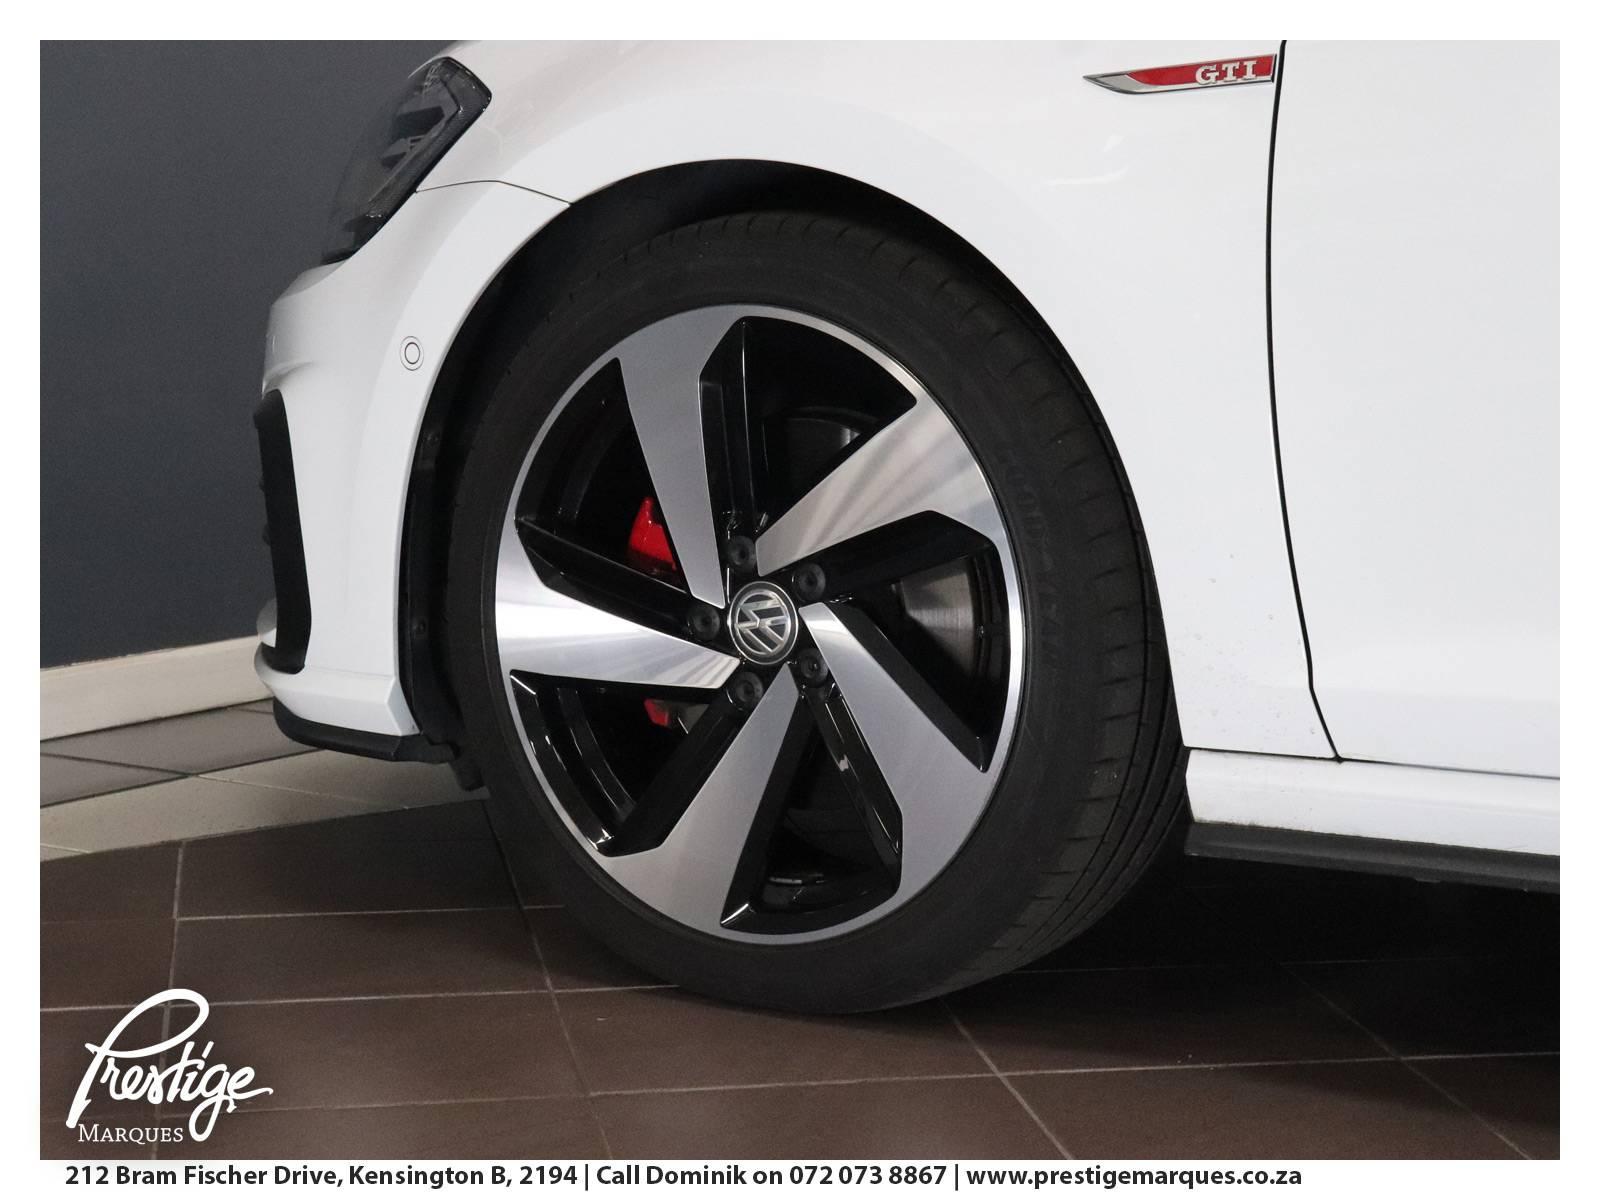 2017-Volkswagen-Golf-GTI-DSG-Facelift-Prestige-Marques-Randburg-Sandton-9